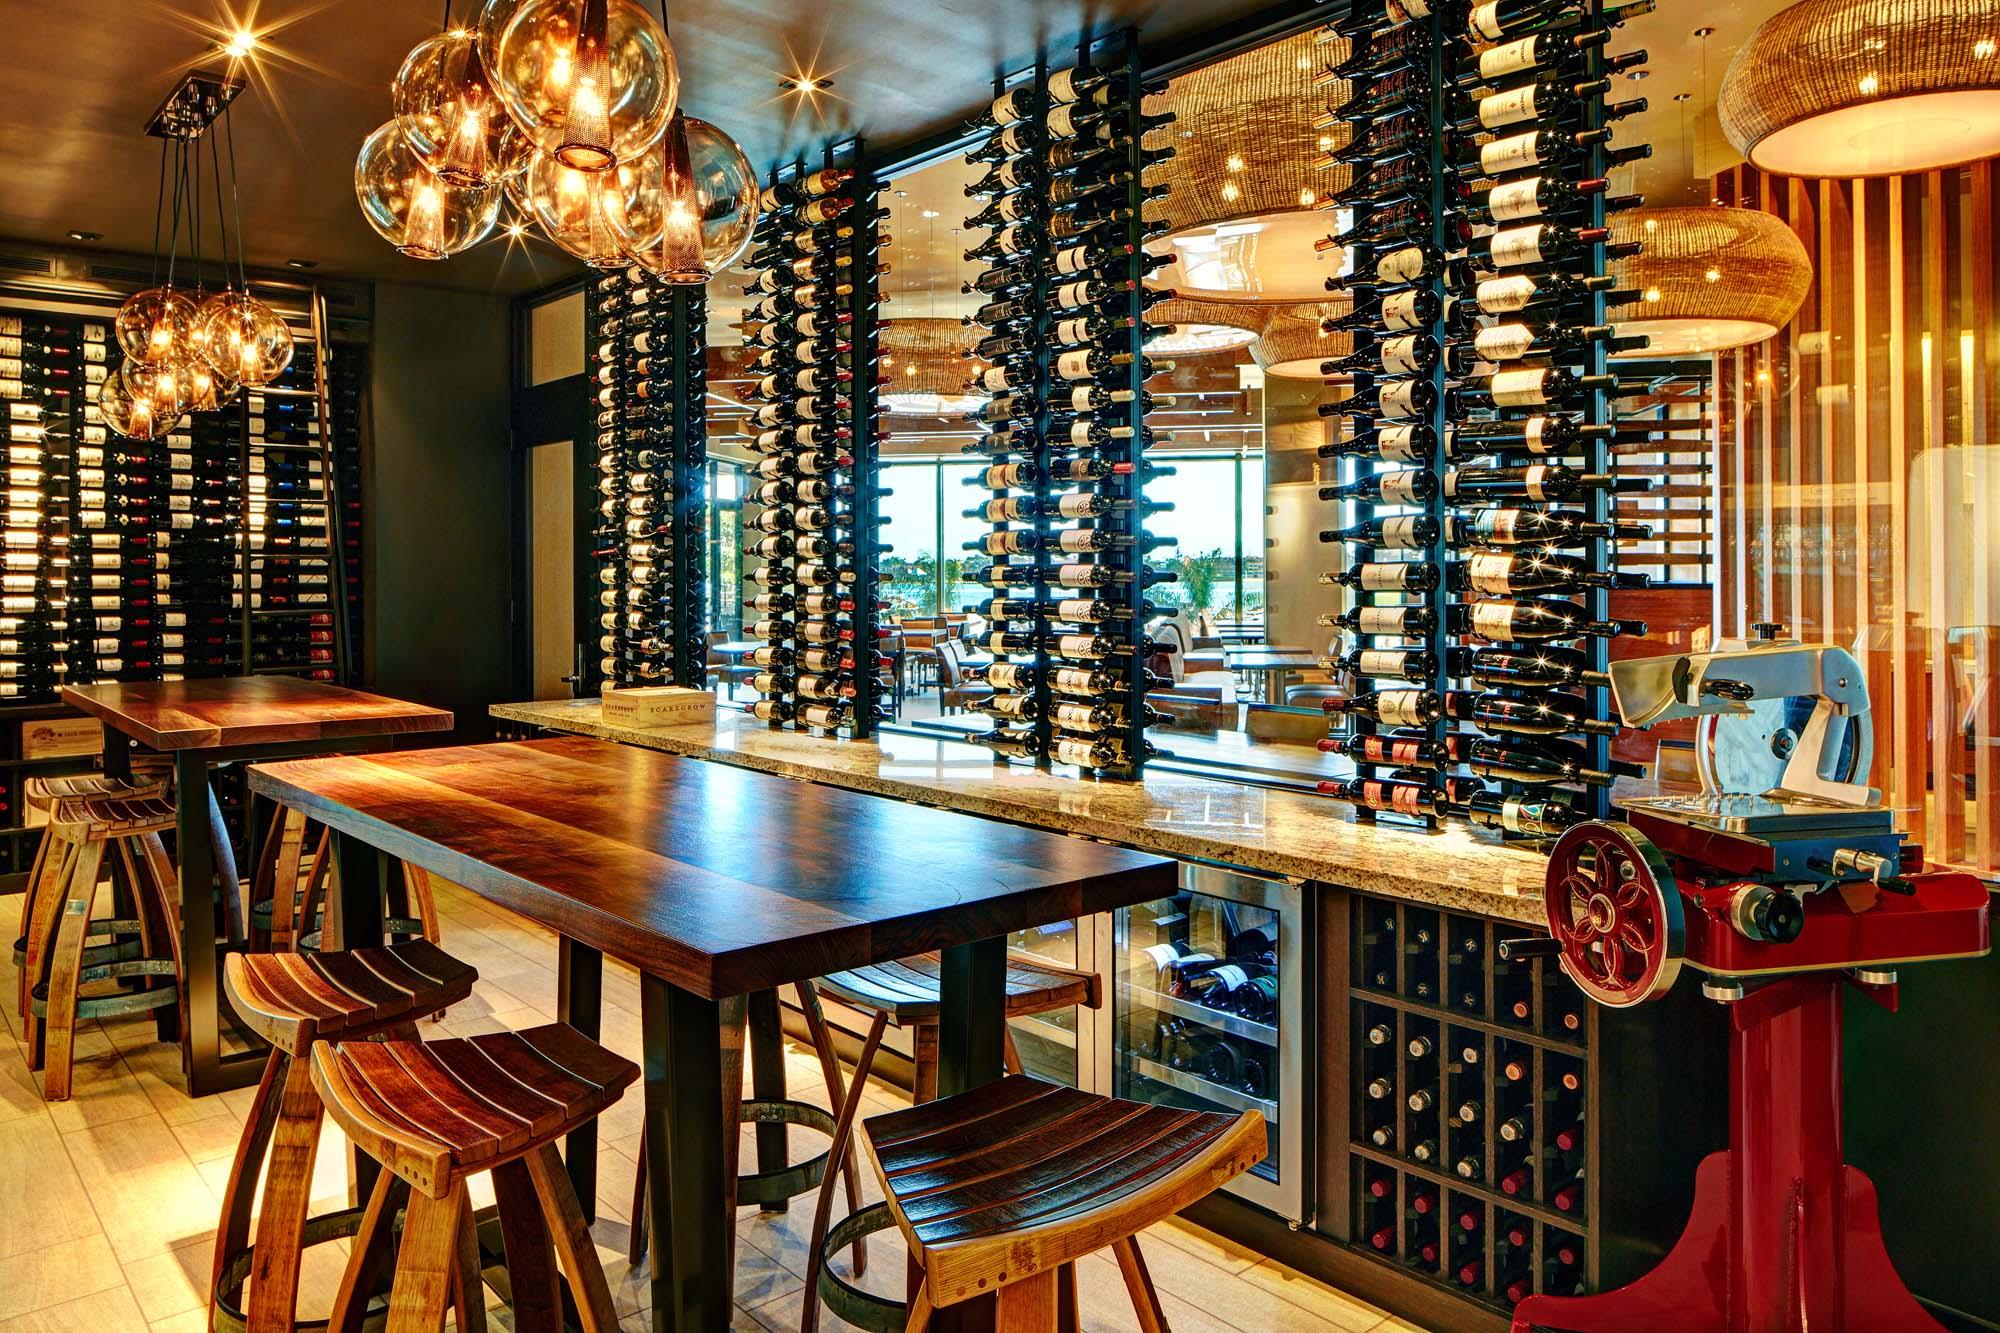 SANDT_Segarra_May2012_Marina_Kitchen_Wine_Cellar_f.jpg